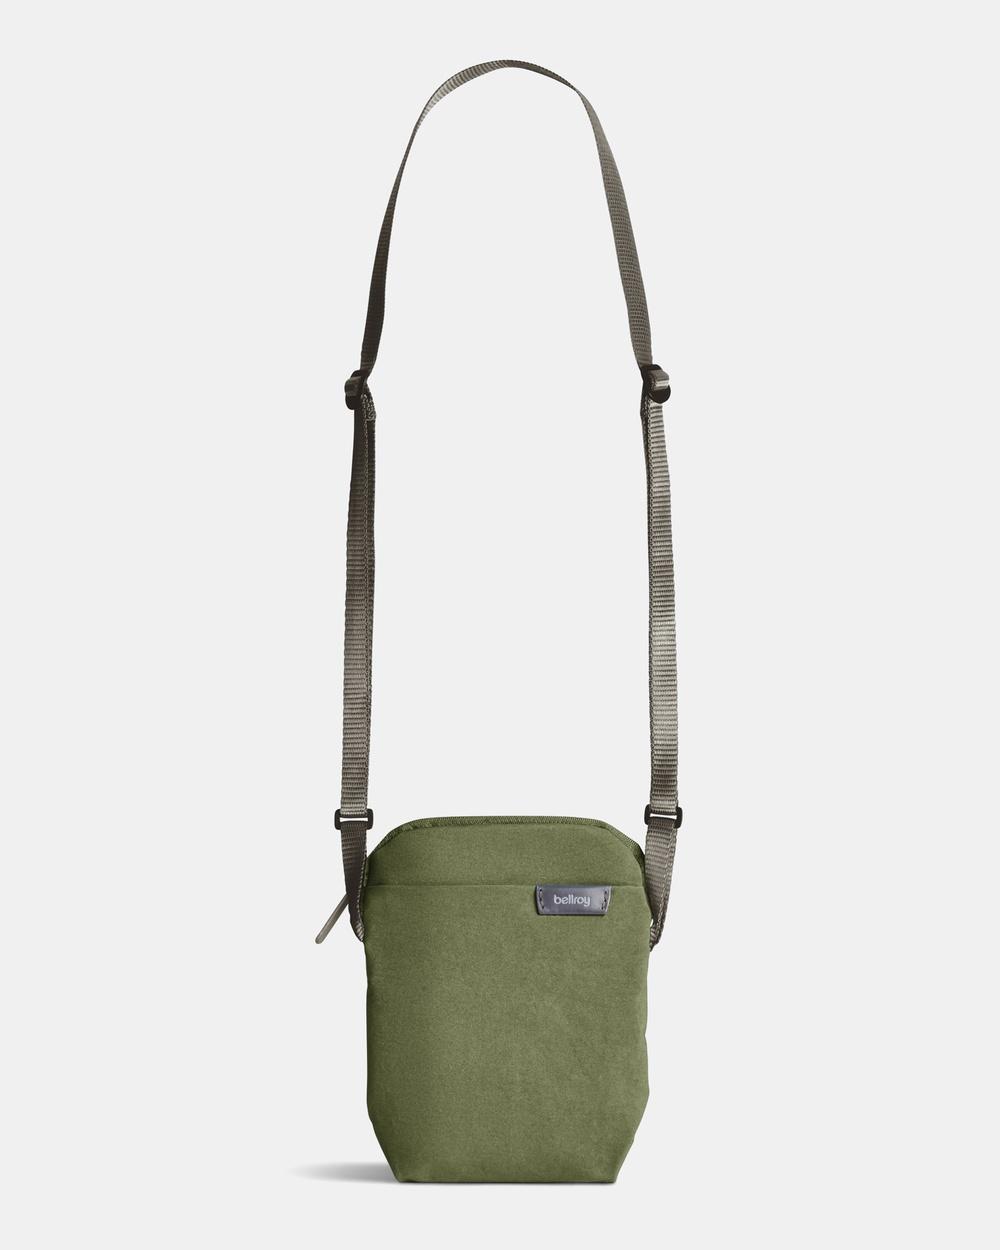 Bellroy City Pouch Bags green